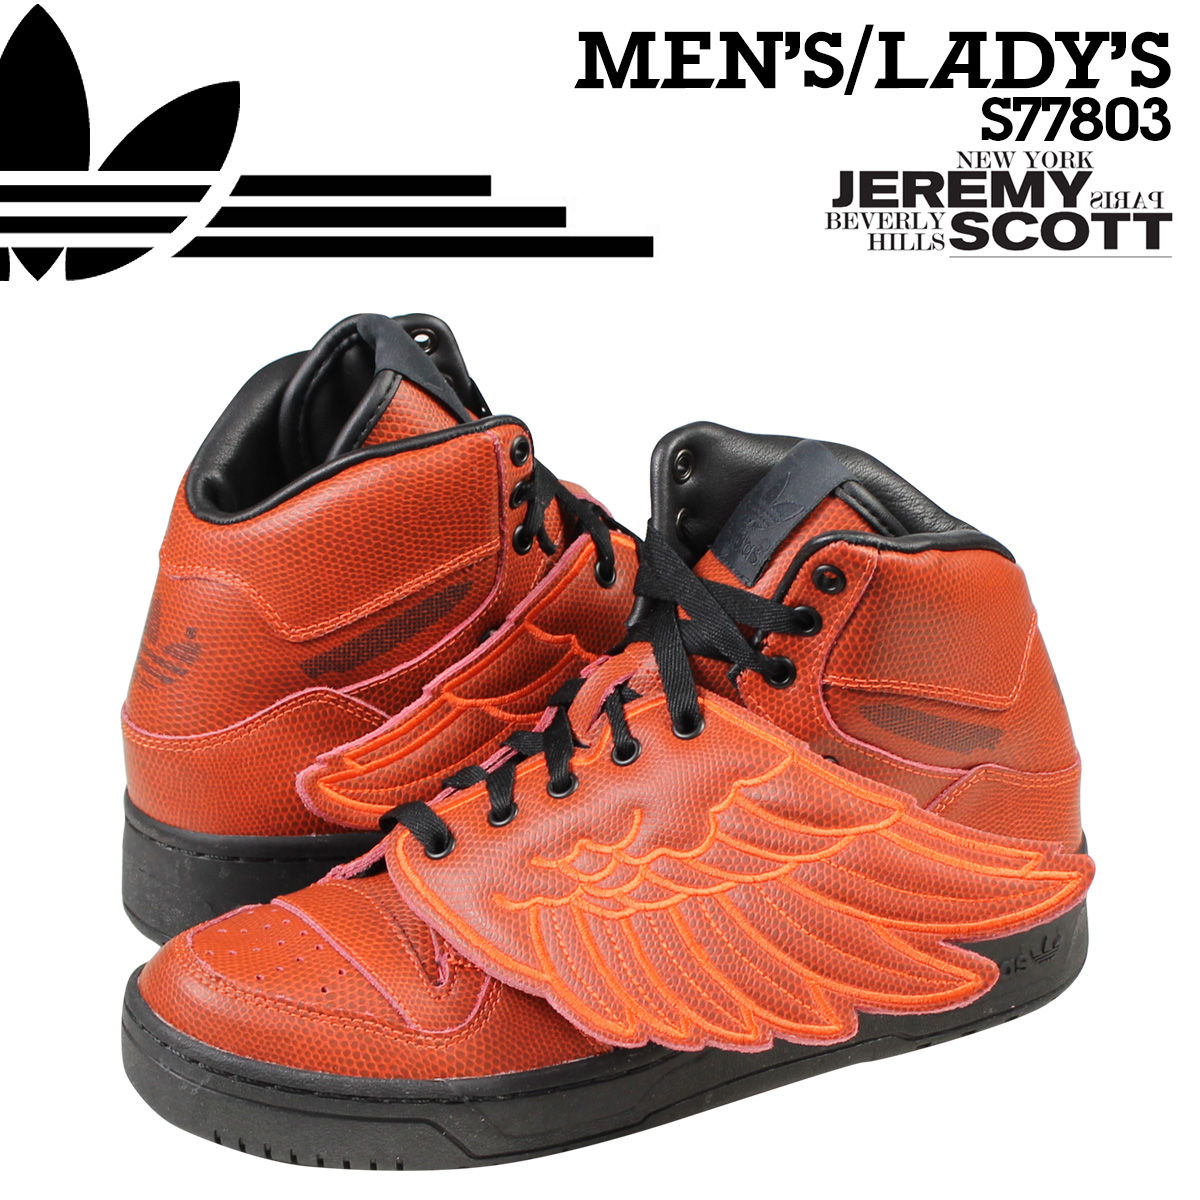 adidas Originals アディダス オリジナルス スニーカー ジェレミースコット JS WINGS 2.0 MESH S77803 メンズ レディース 靴 レッド